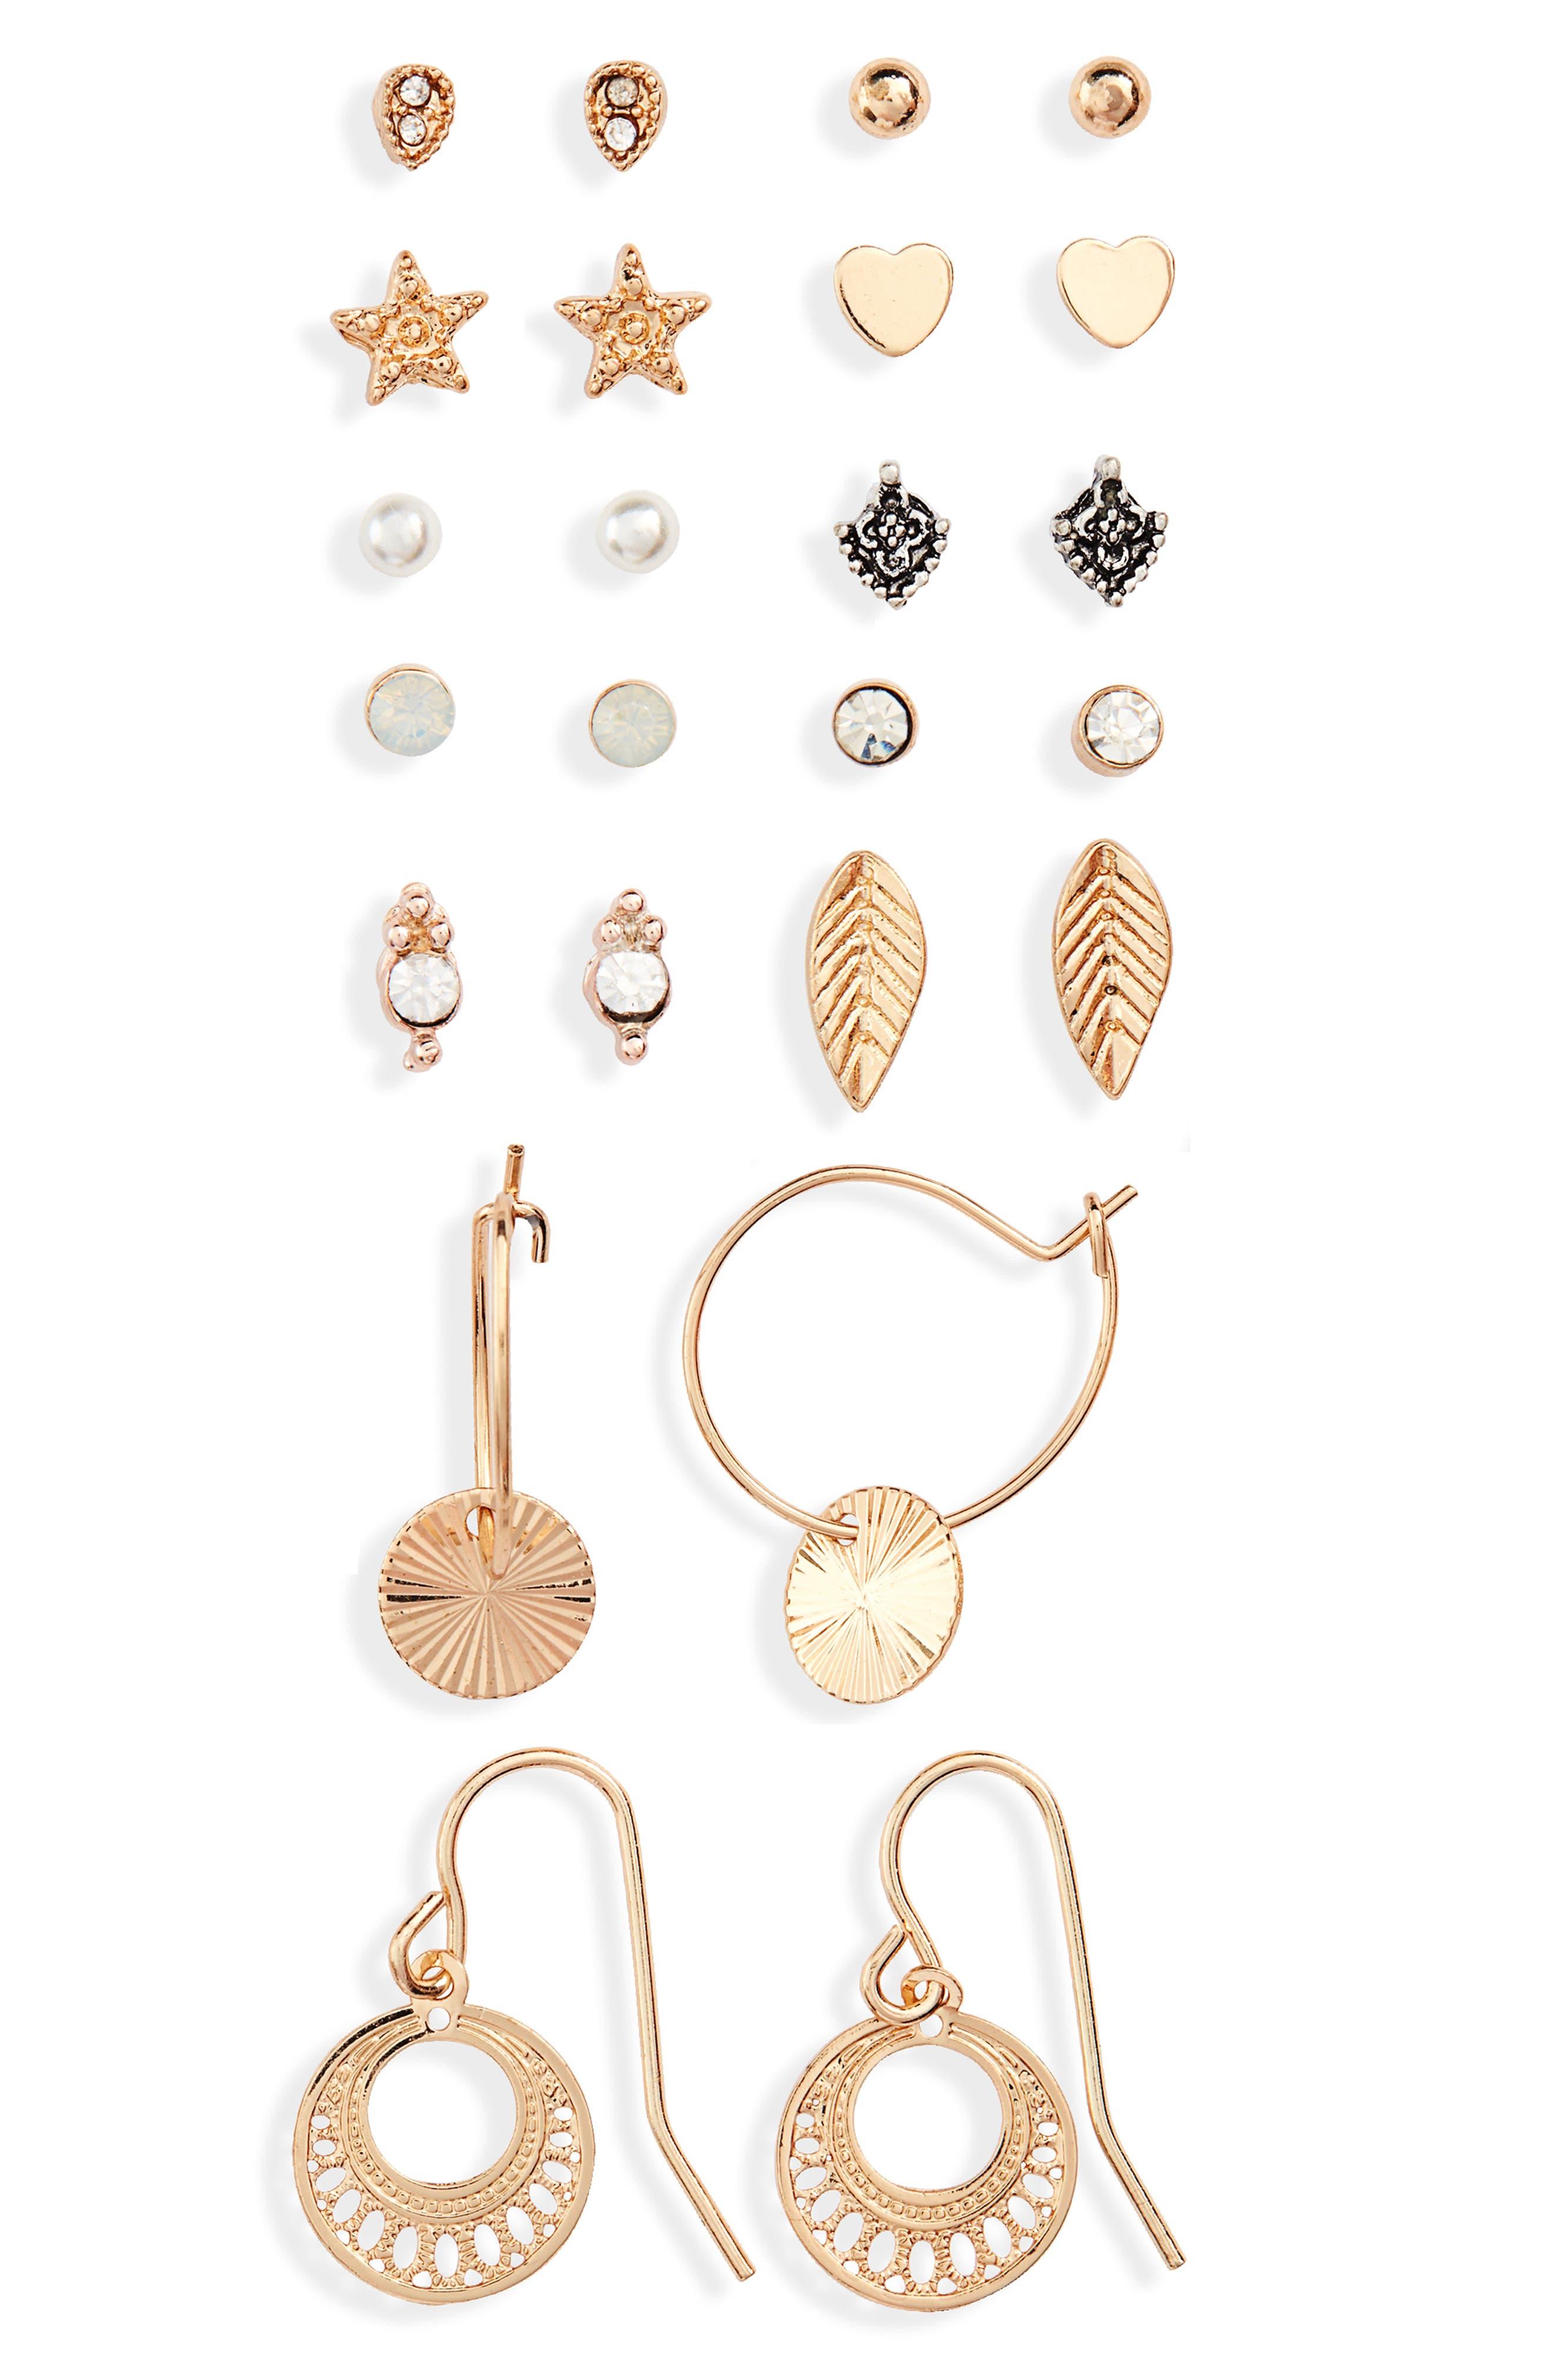 Topshop Set of 12 Fine Earrings